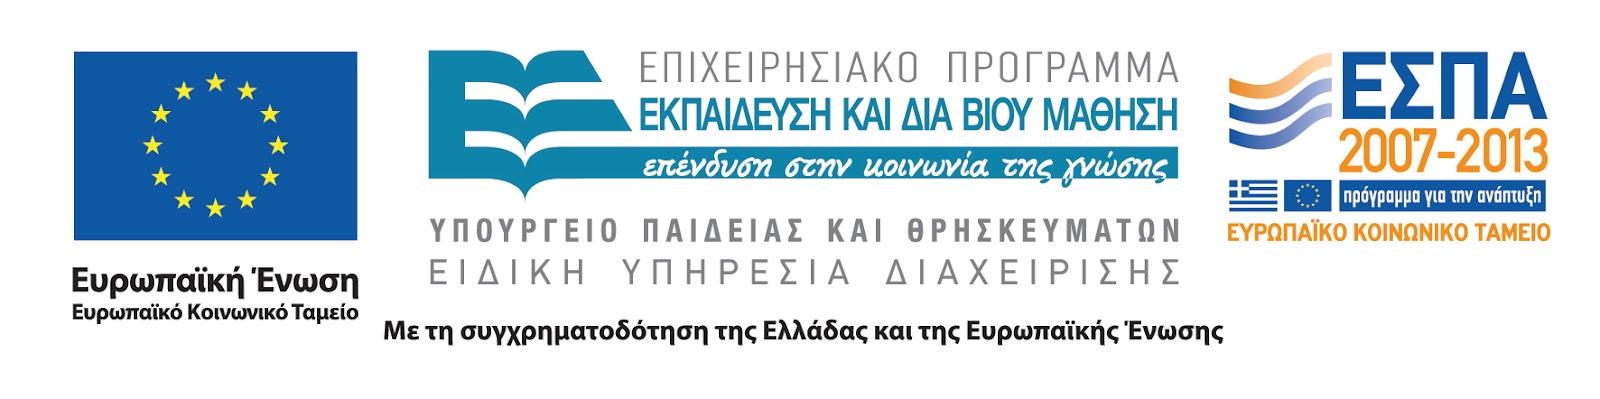 C:\Users\spatoucha\Desktop\Logo ΕΠΕΕΔΒΜ-2013.jpg